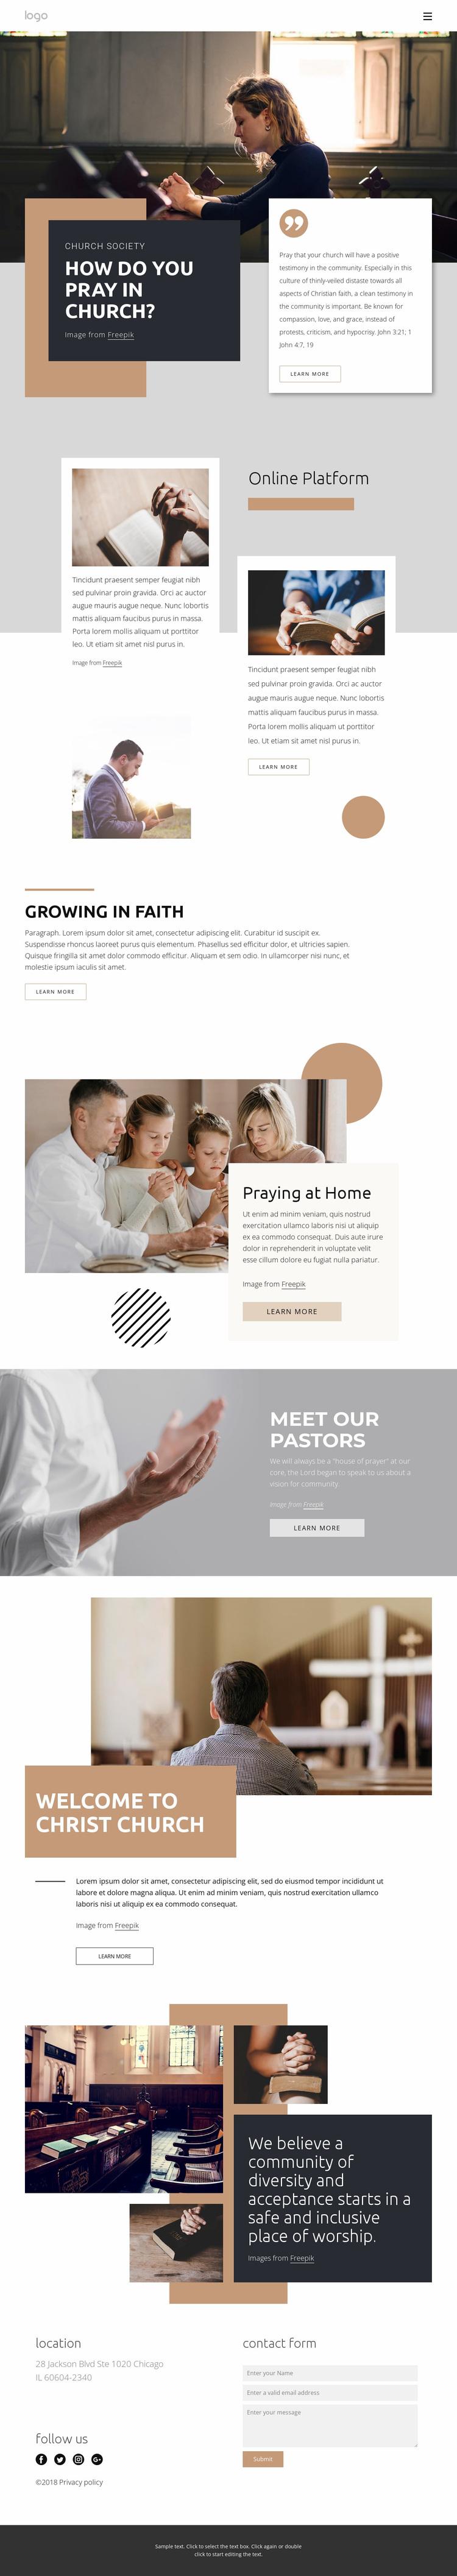 Bible reading Website Design